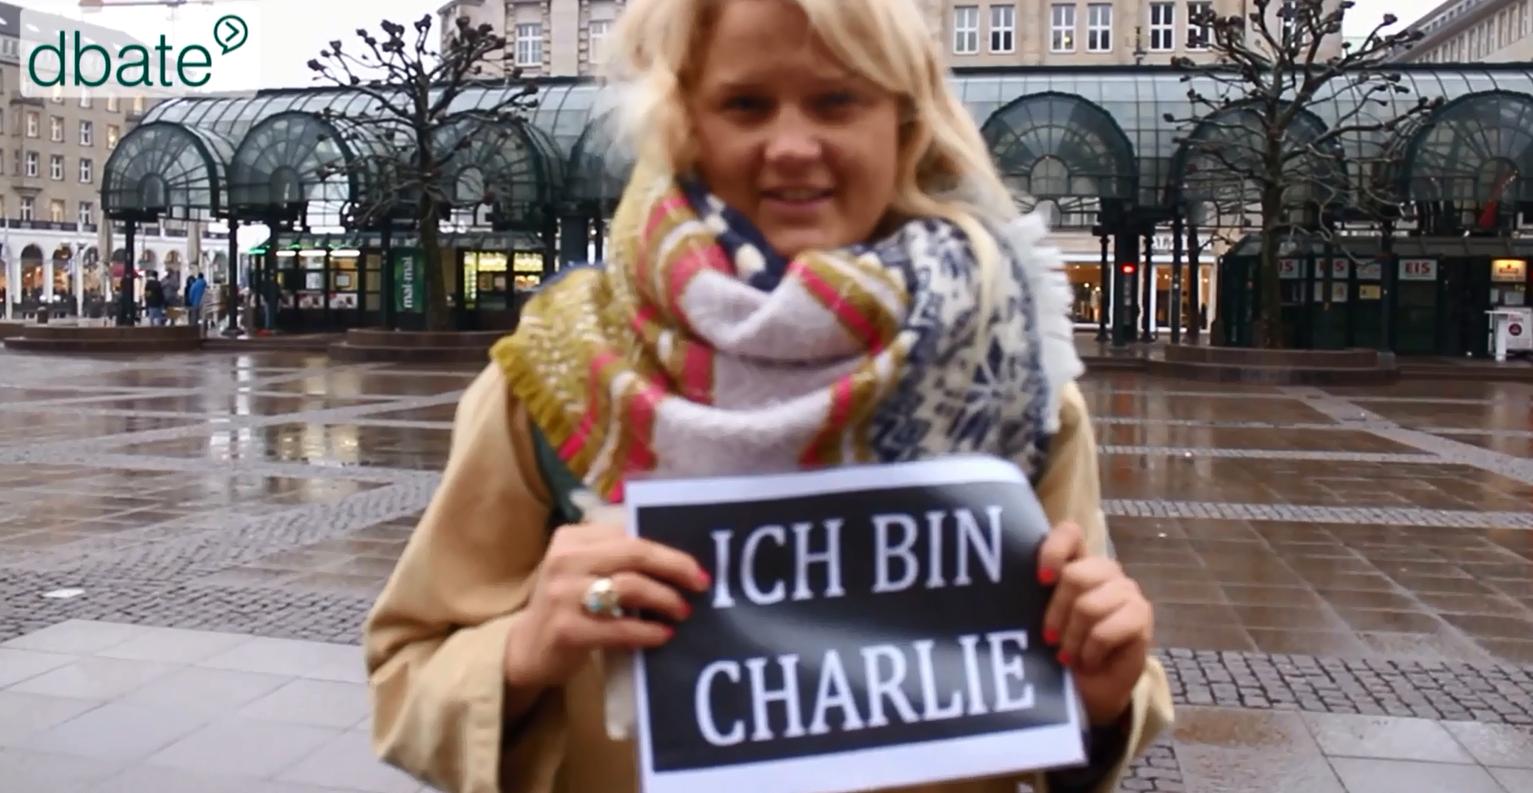 Screenshot_Umfragen_IchbinCharlie_Frau